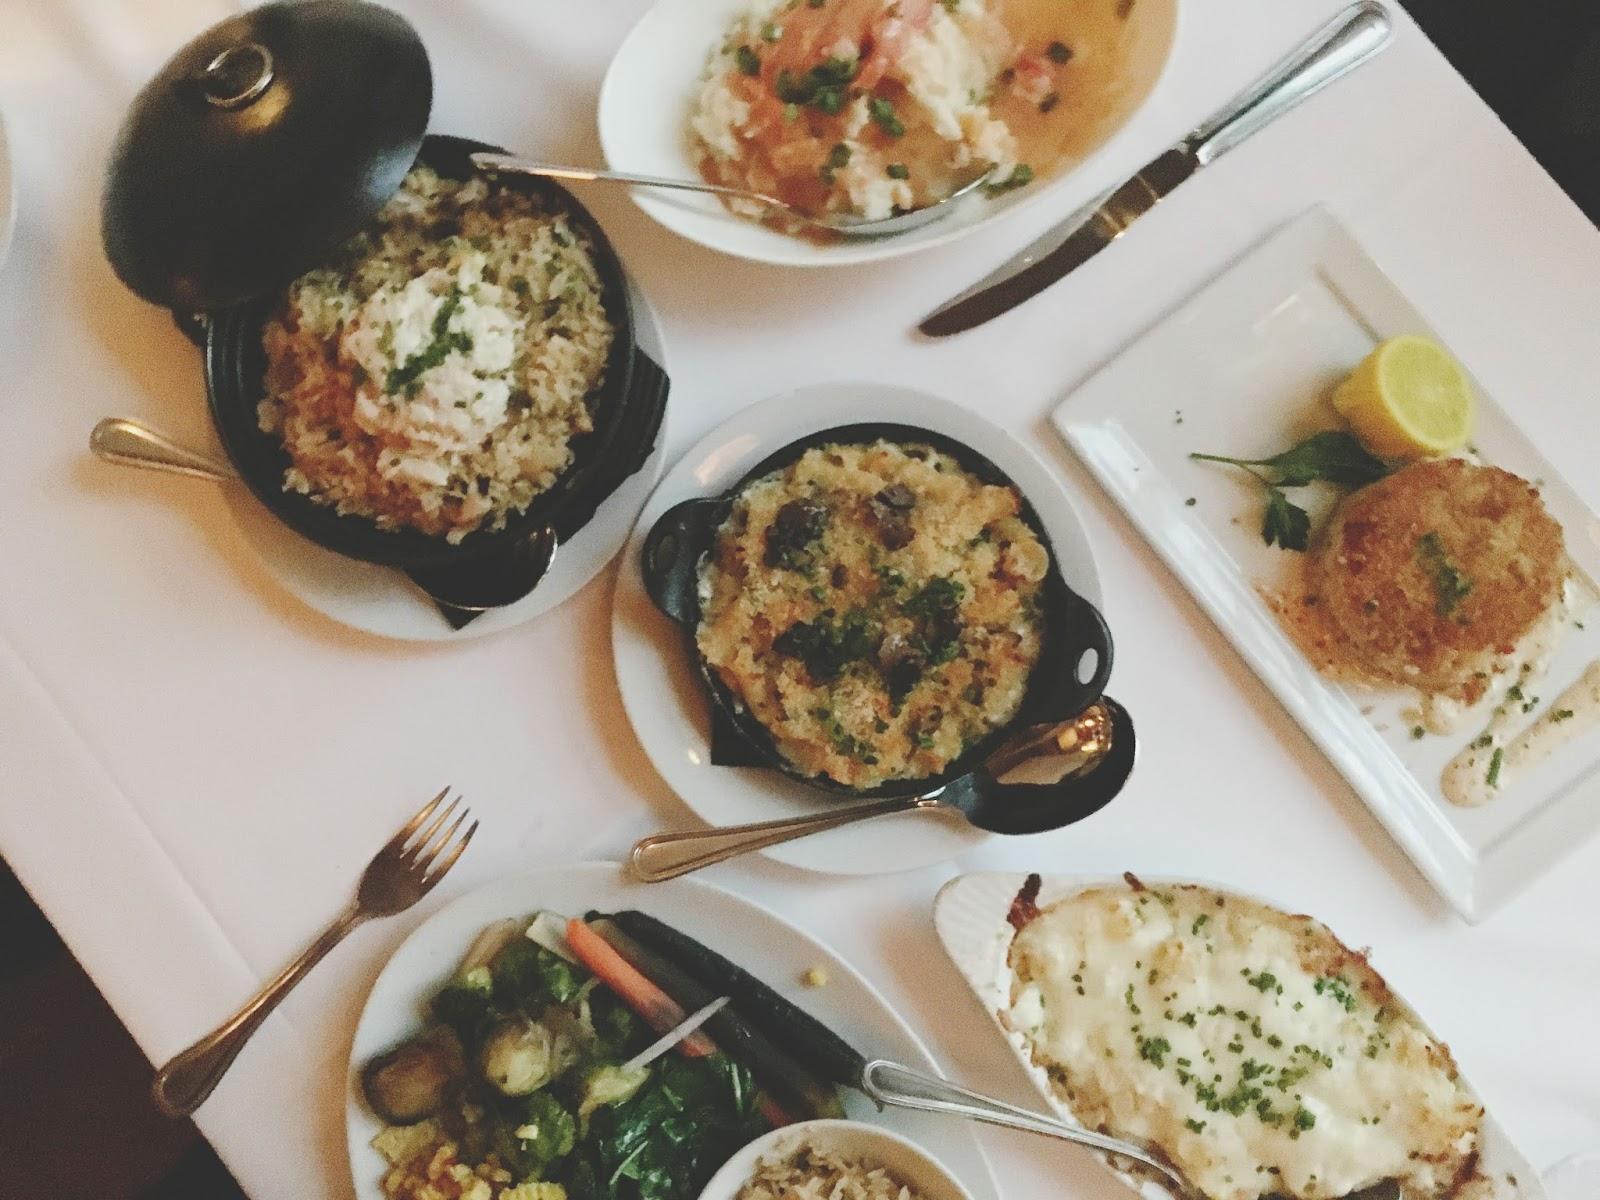 food at Eddie V's - A restaurant in Houston, Texas